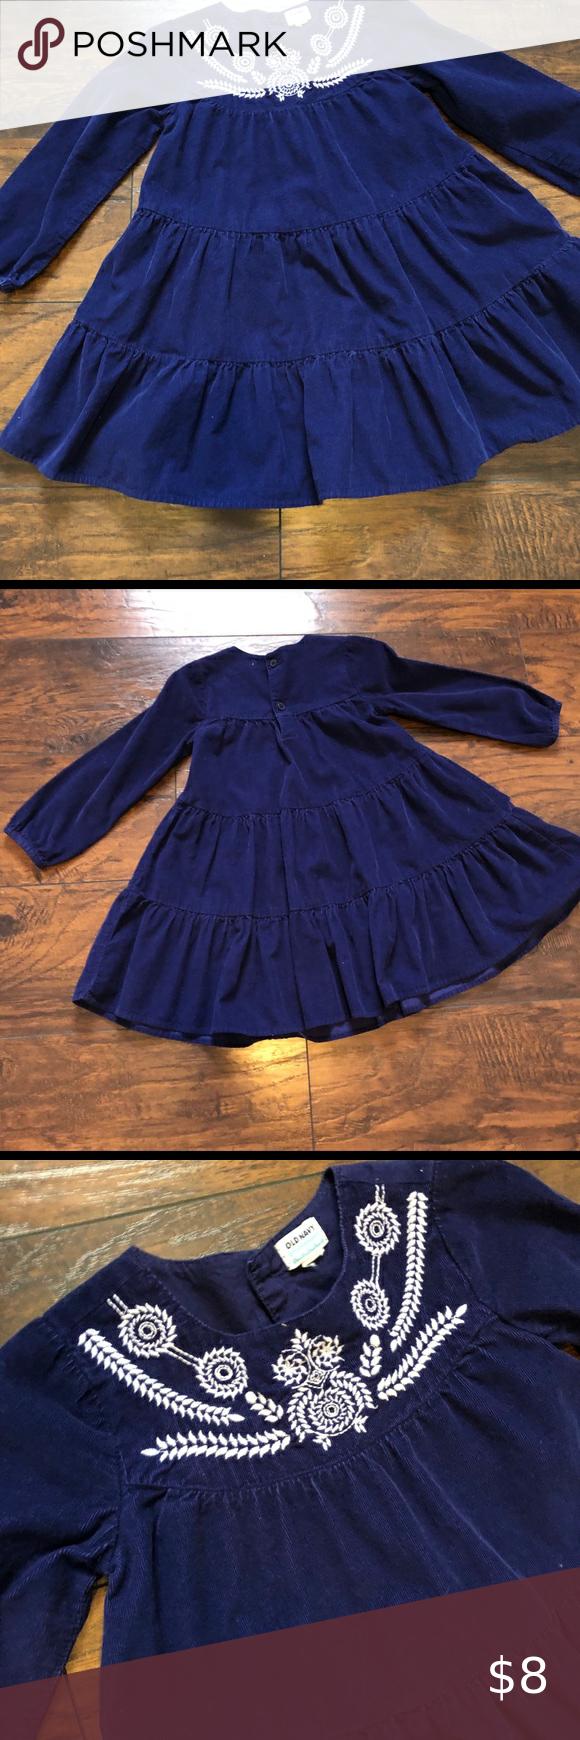 Girls 5t Long Sleeve Corduroy Dress Corduroy Dress Casual Dresses Clothes Design [ 1740 x 580 Pixel ]